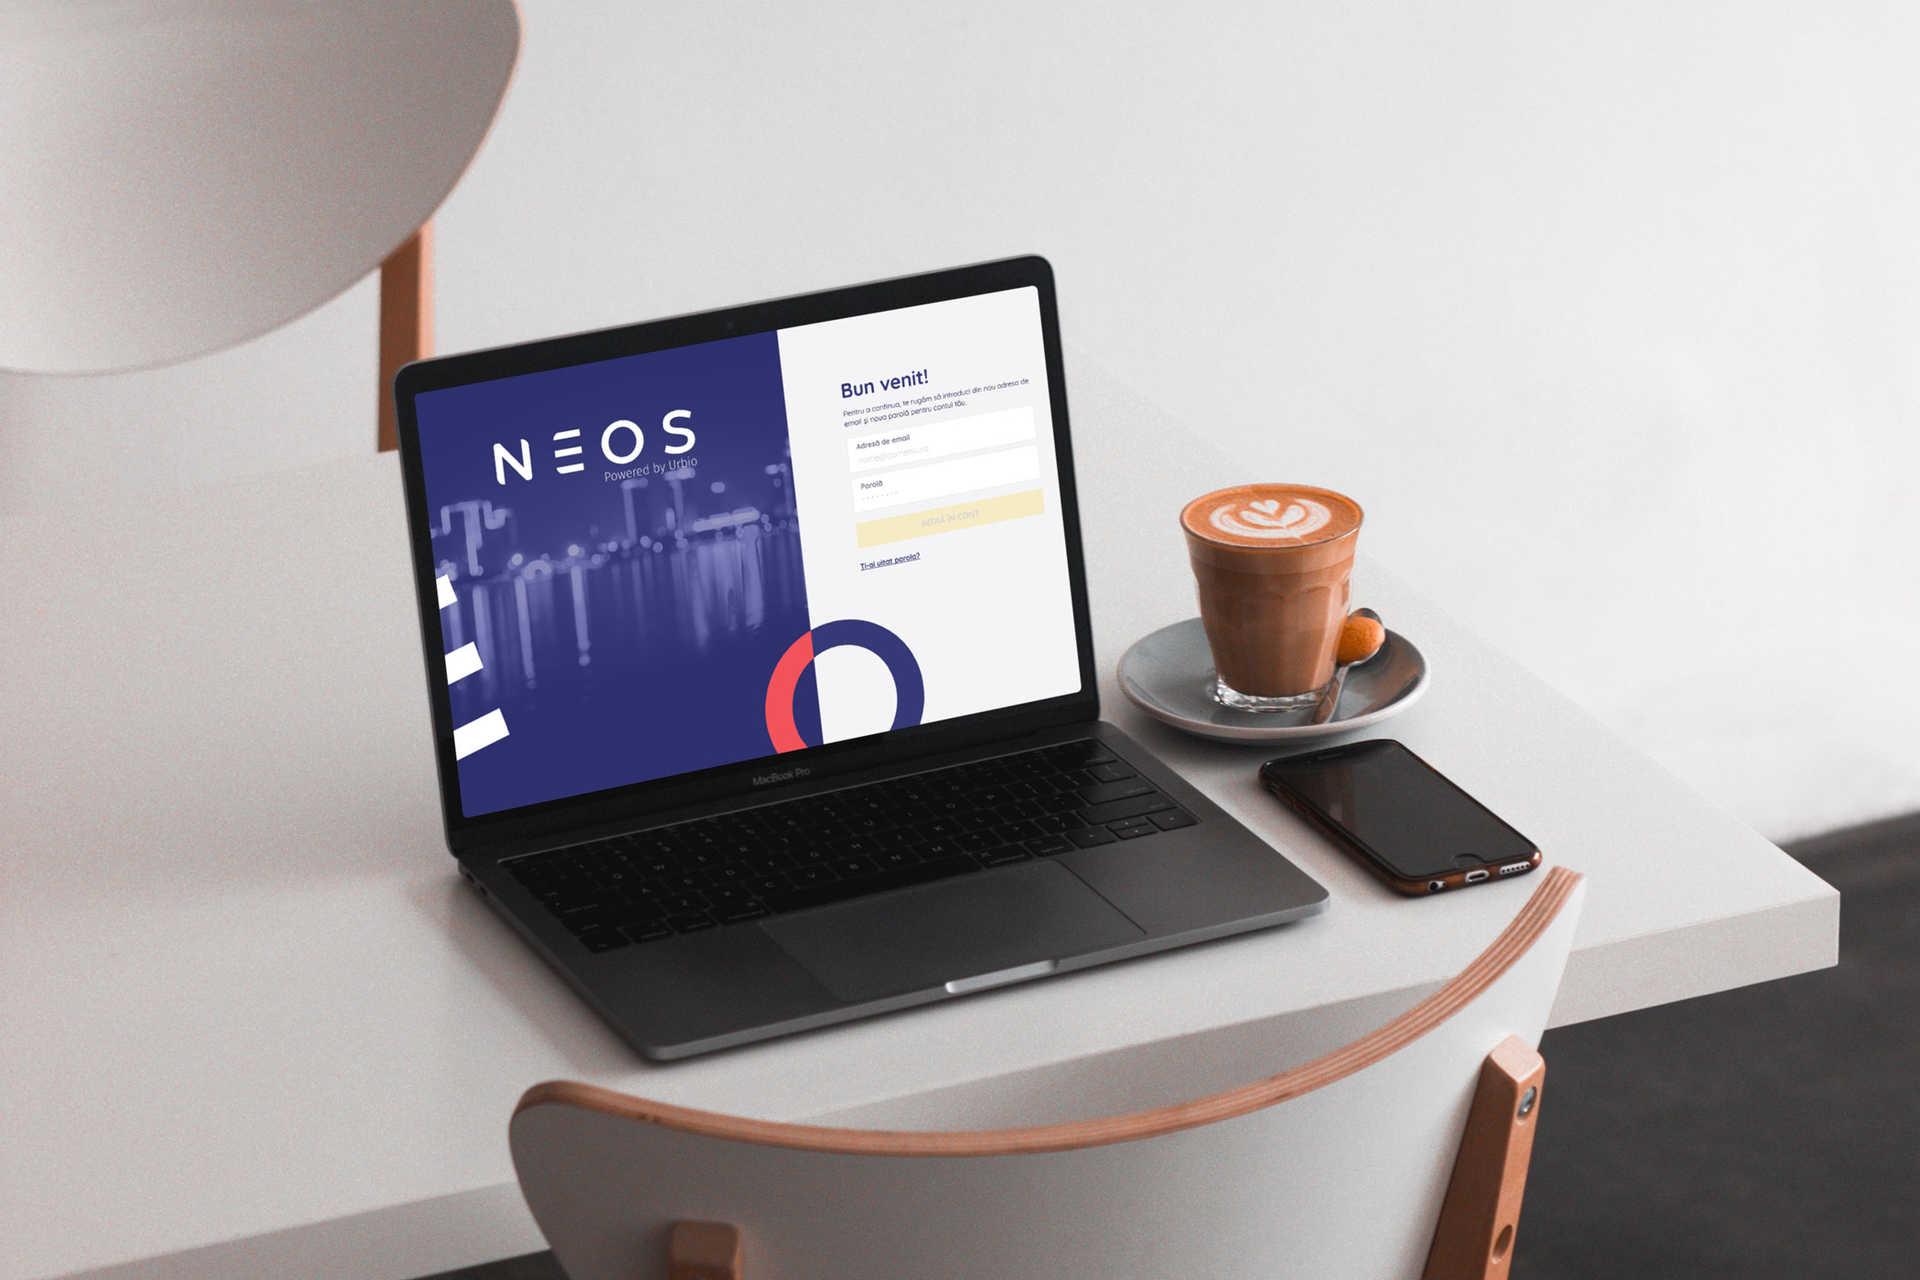 MacBook-on-Table-Mockup.jpg